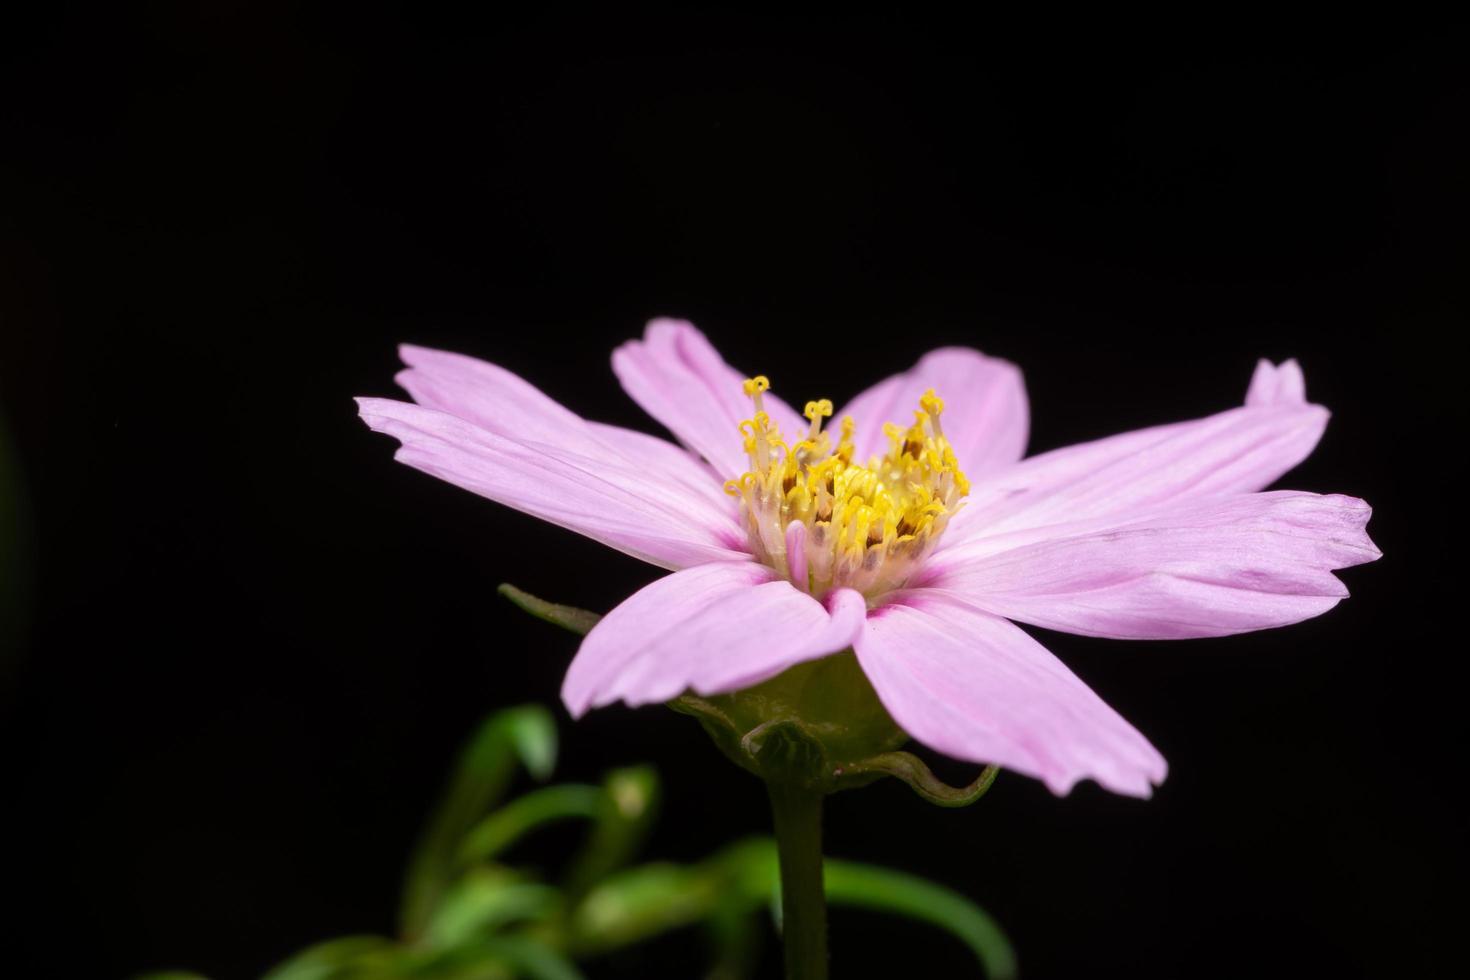 Chrysanthemum flower on black background photo